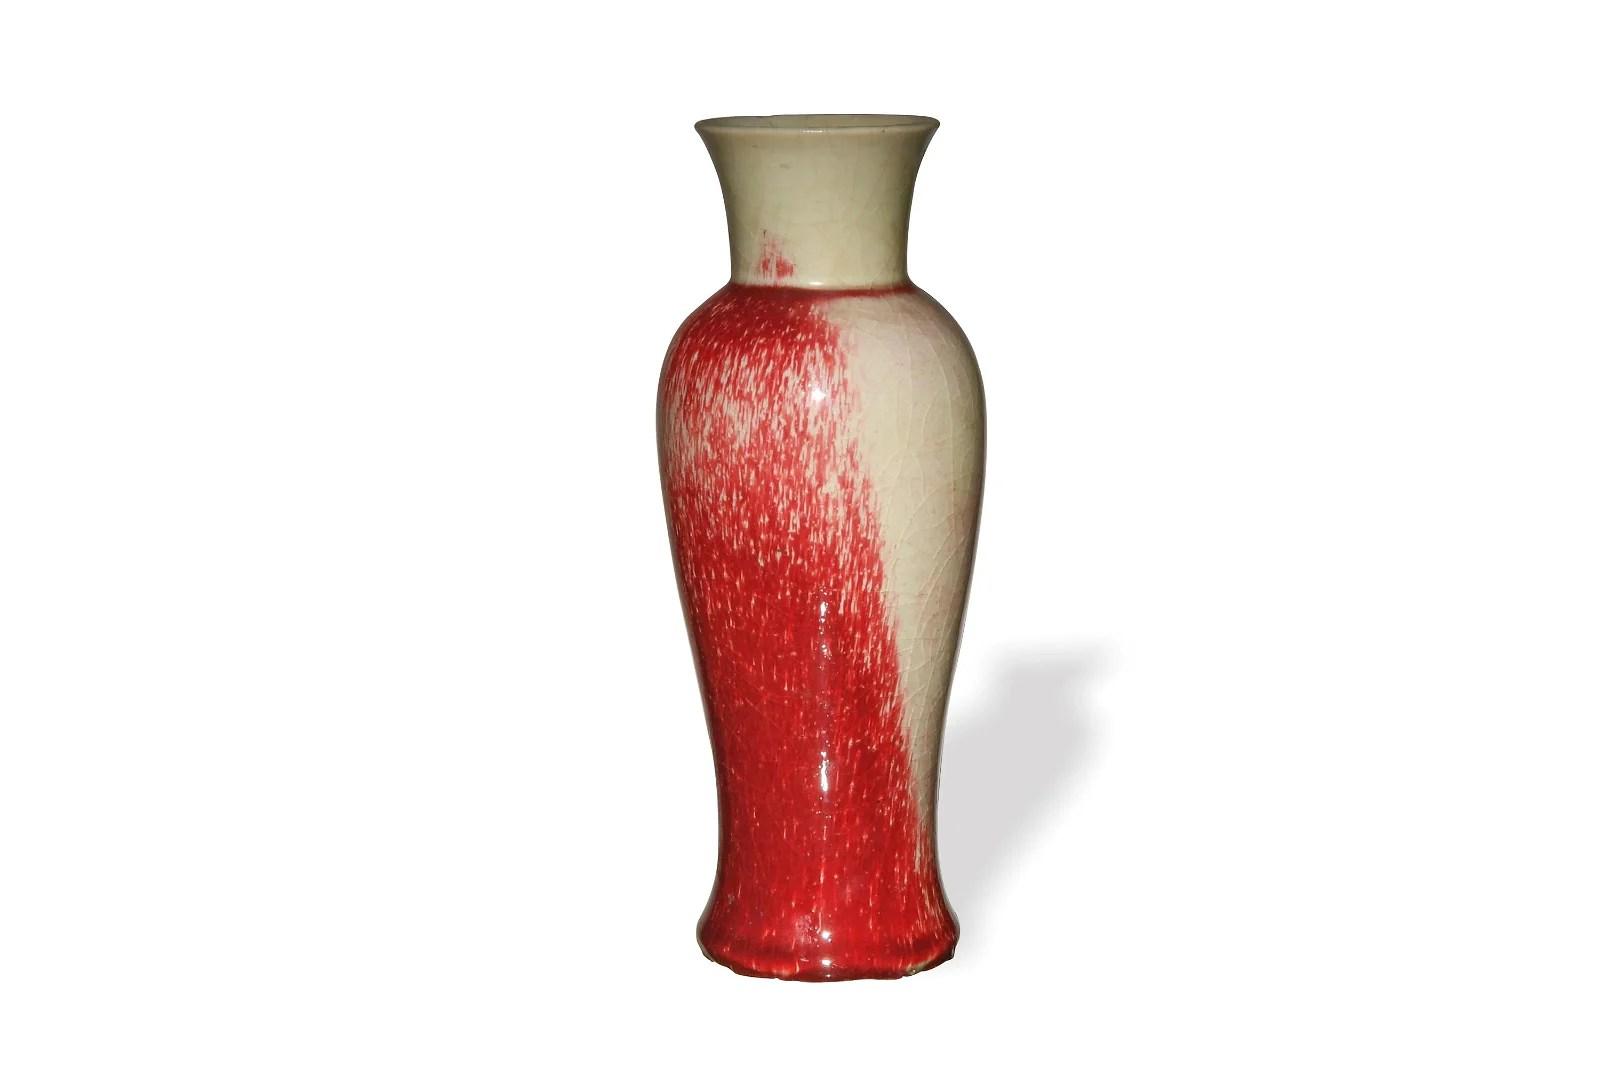 Chinese Langyao Red Glazed Vase, 19th Century